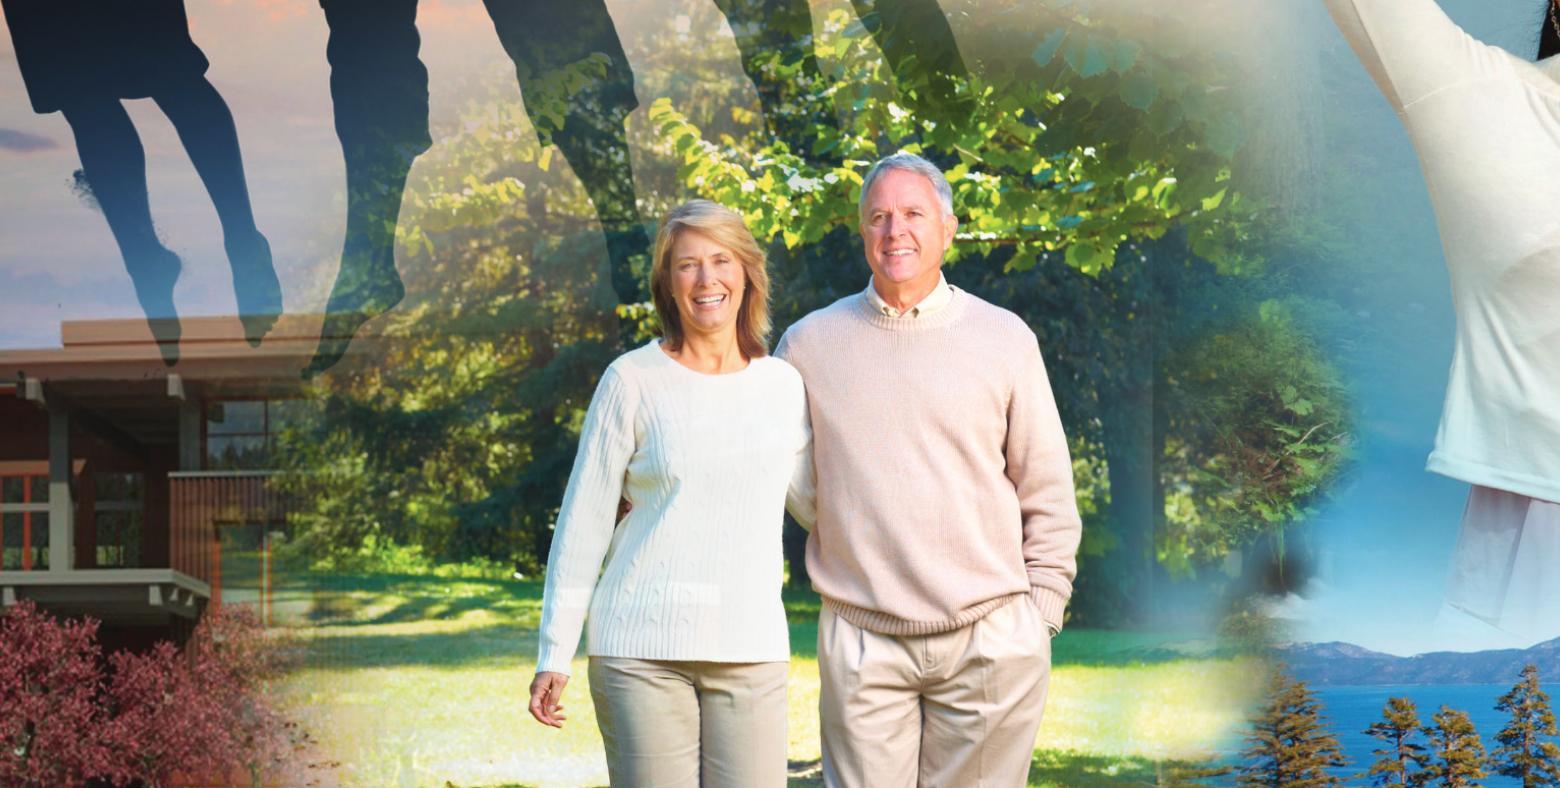 Older couple walking through a park